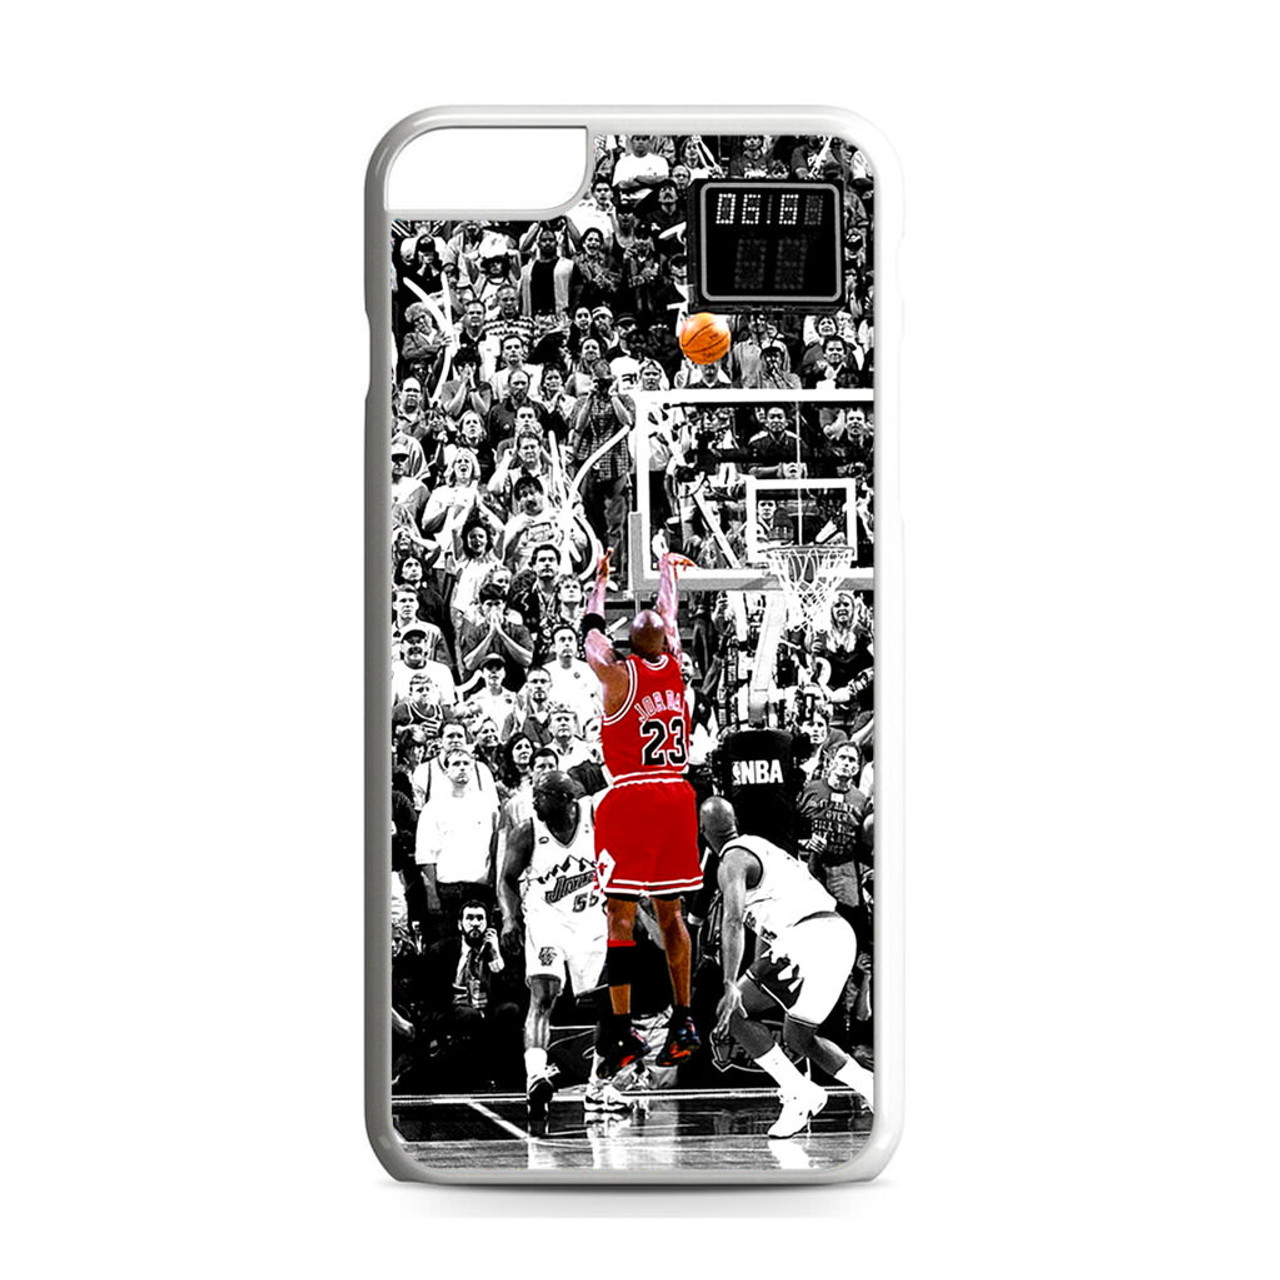 Michael Jordan Shoot in NBA iPhone 6 Plus/6S Plus Case